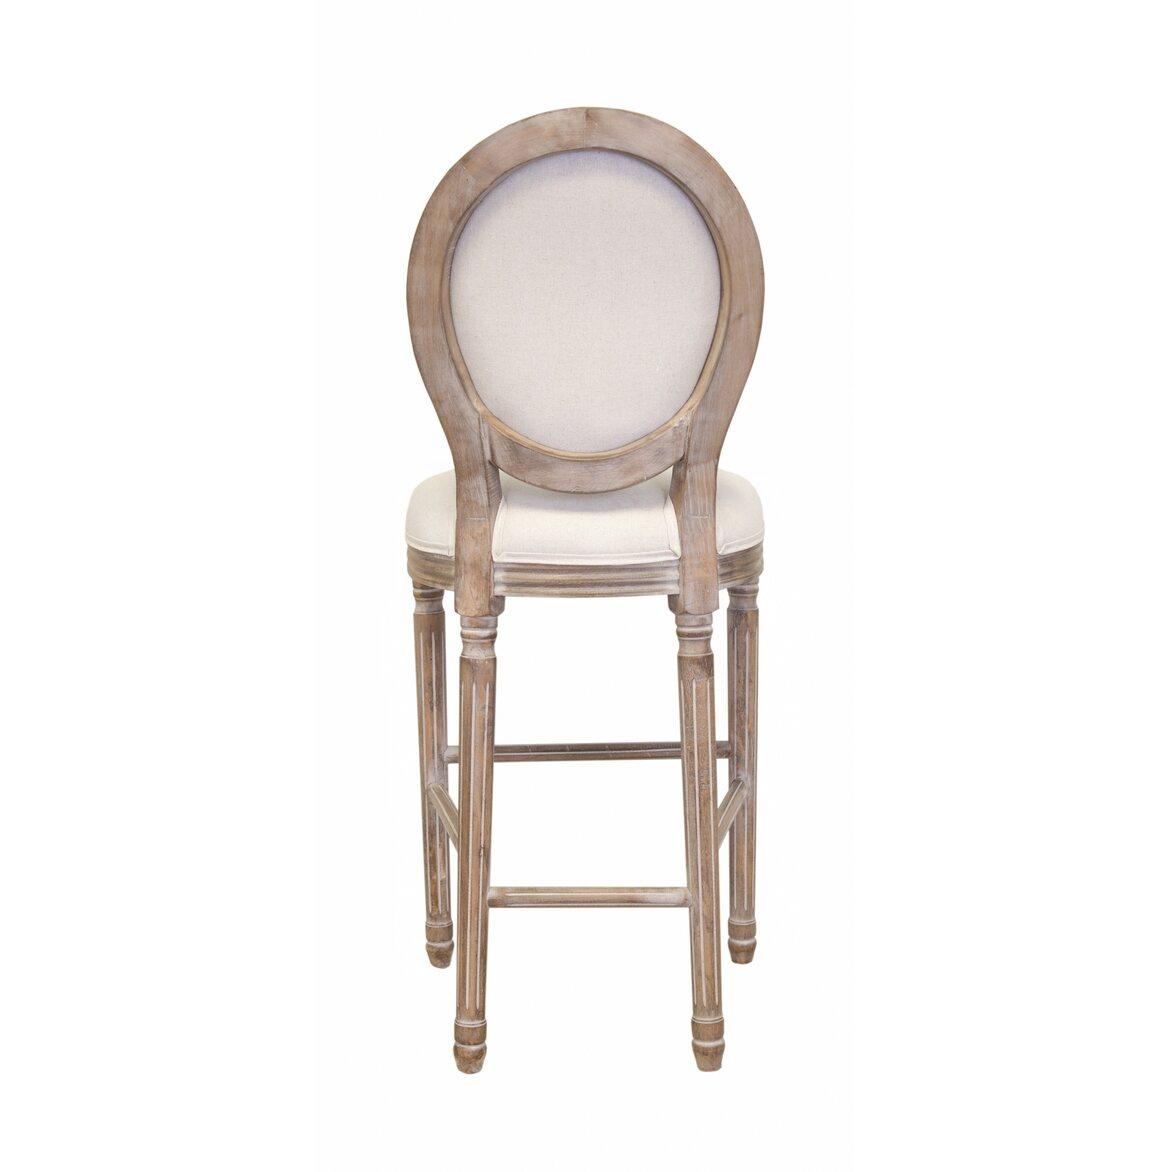 Барный стул Filon ver.2 3 | Барные стулья Kingsby